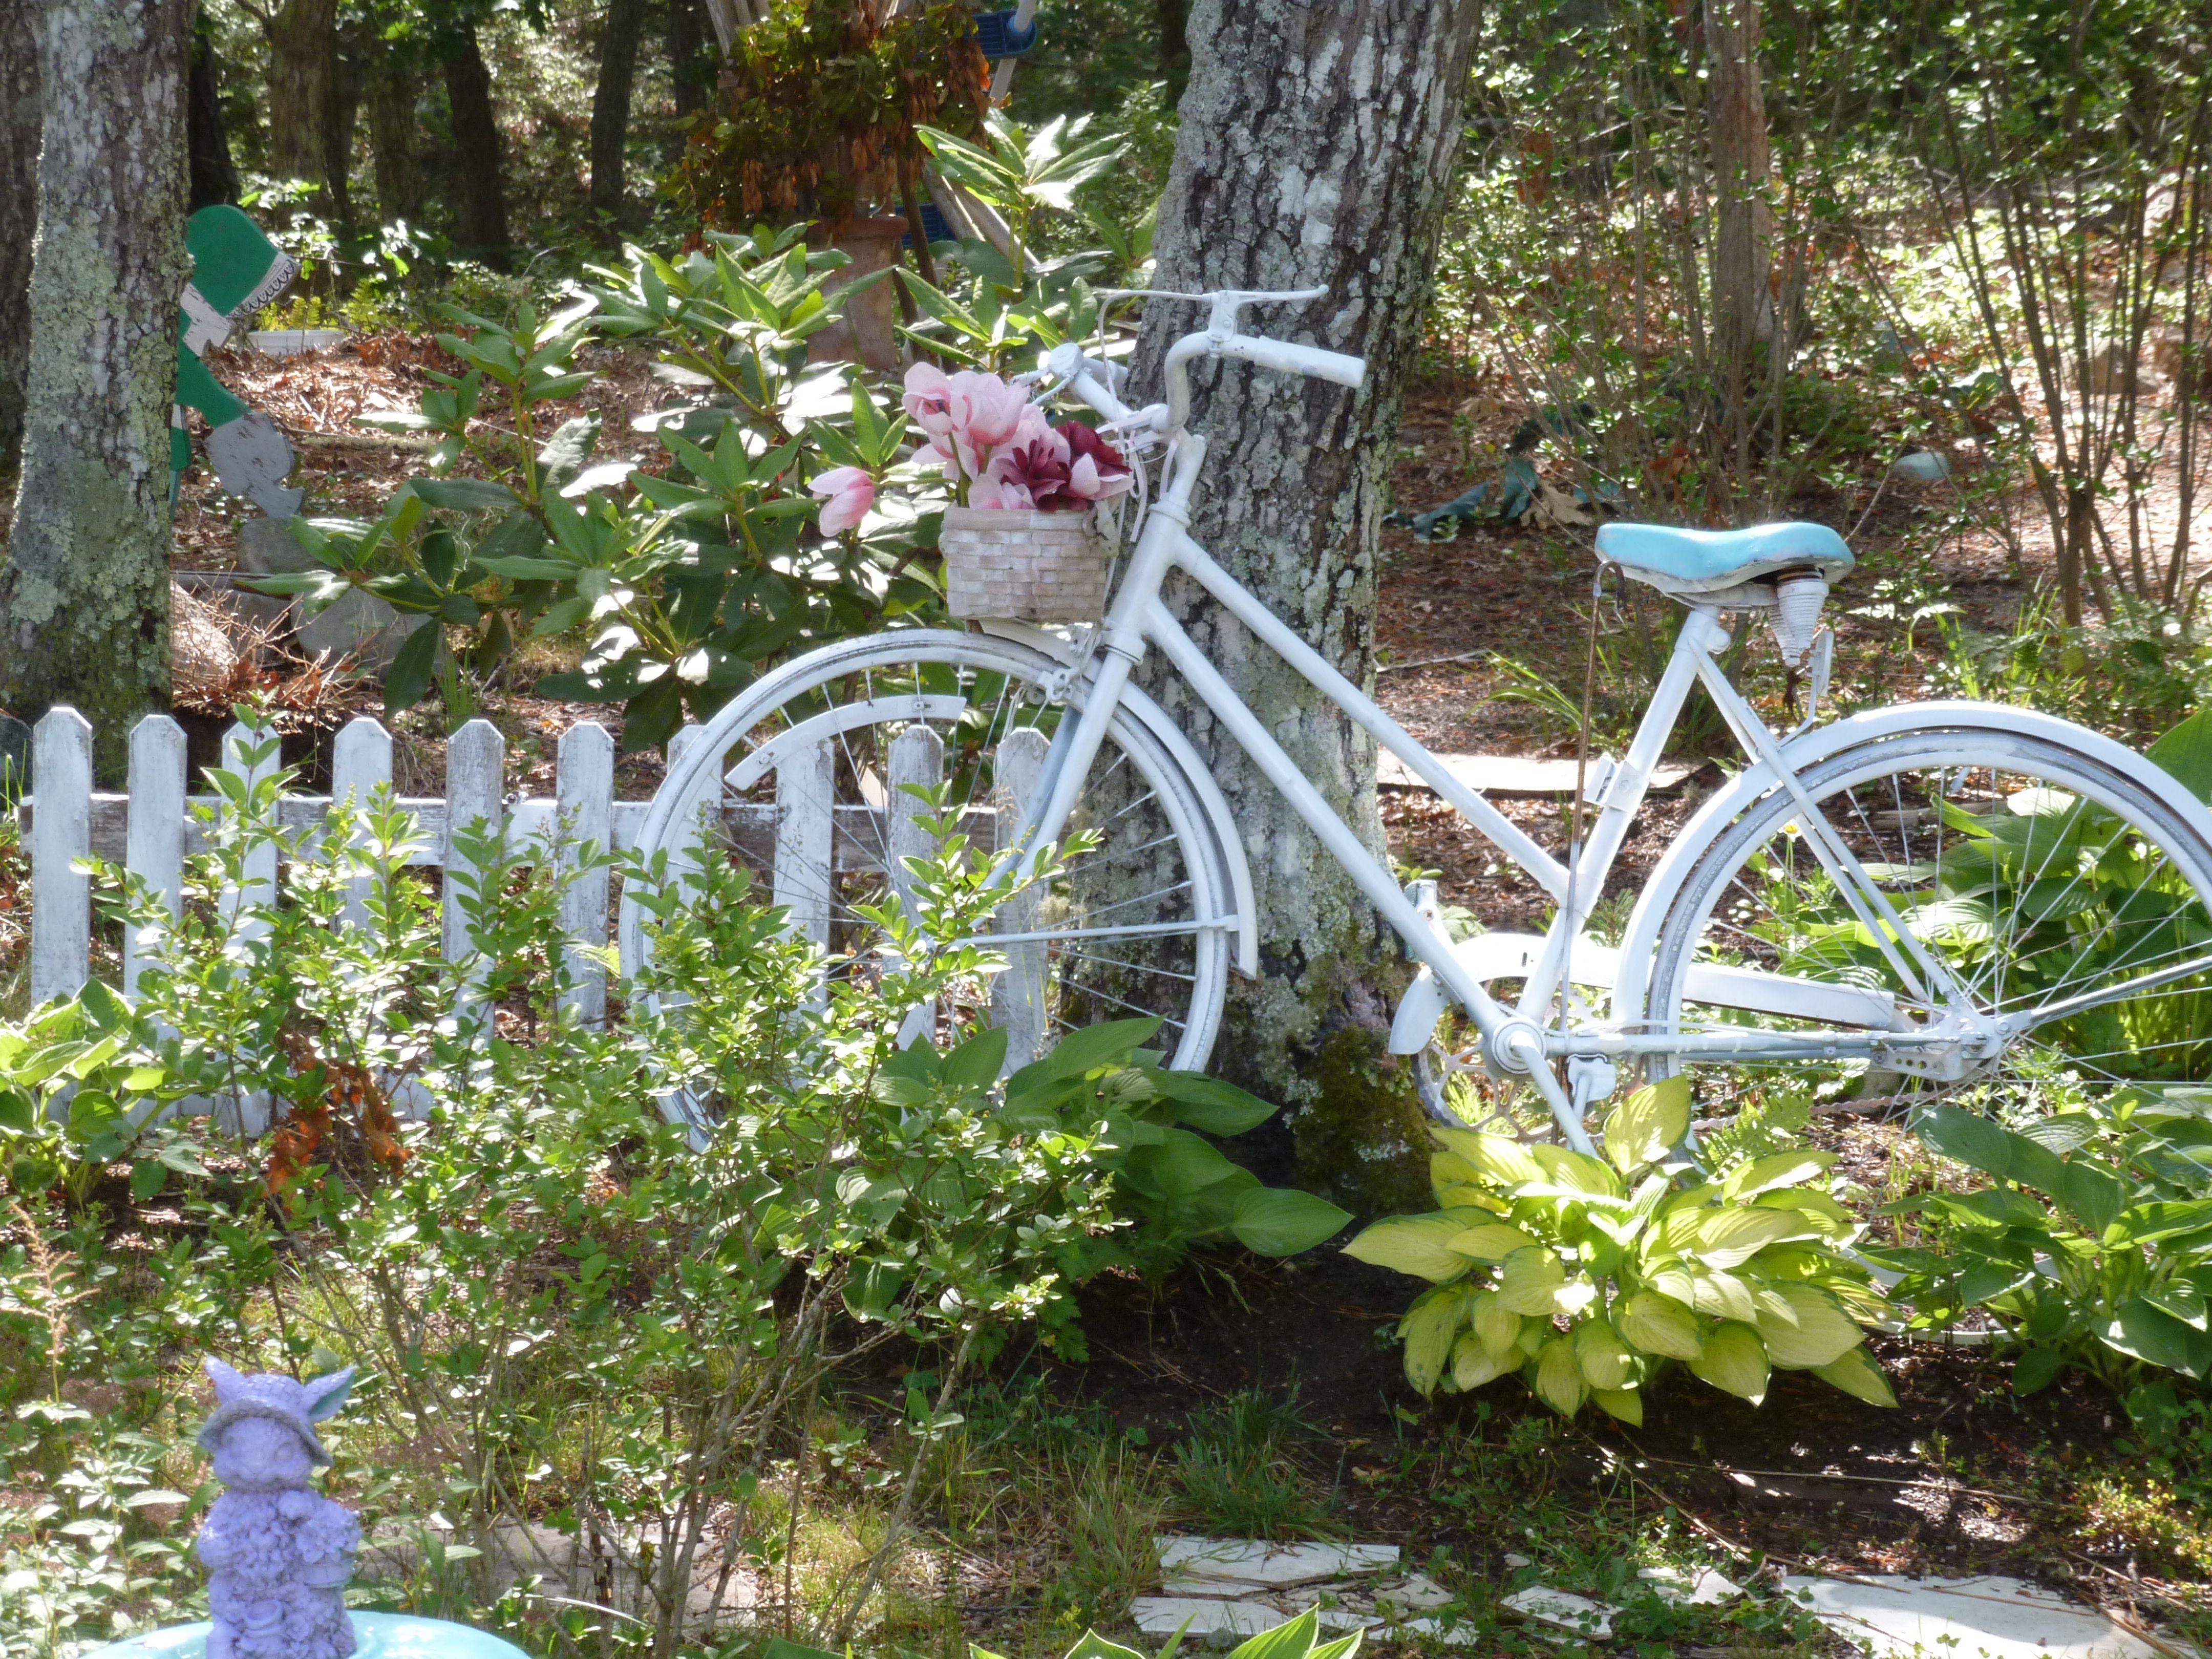 Garden decor bicycle  Shabby Chic bike in the garden  Shabby Vintage Bikes  Pinterest